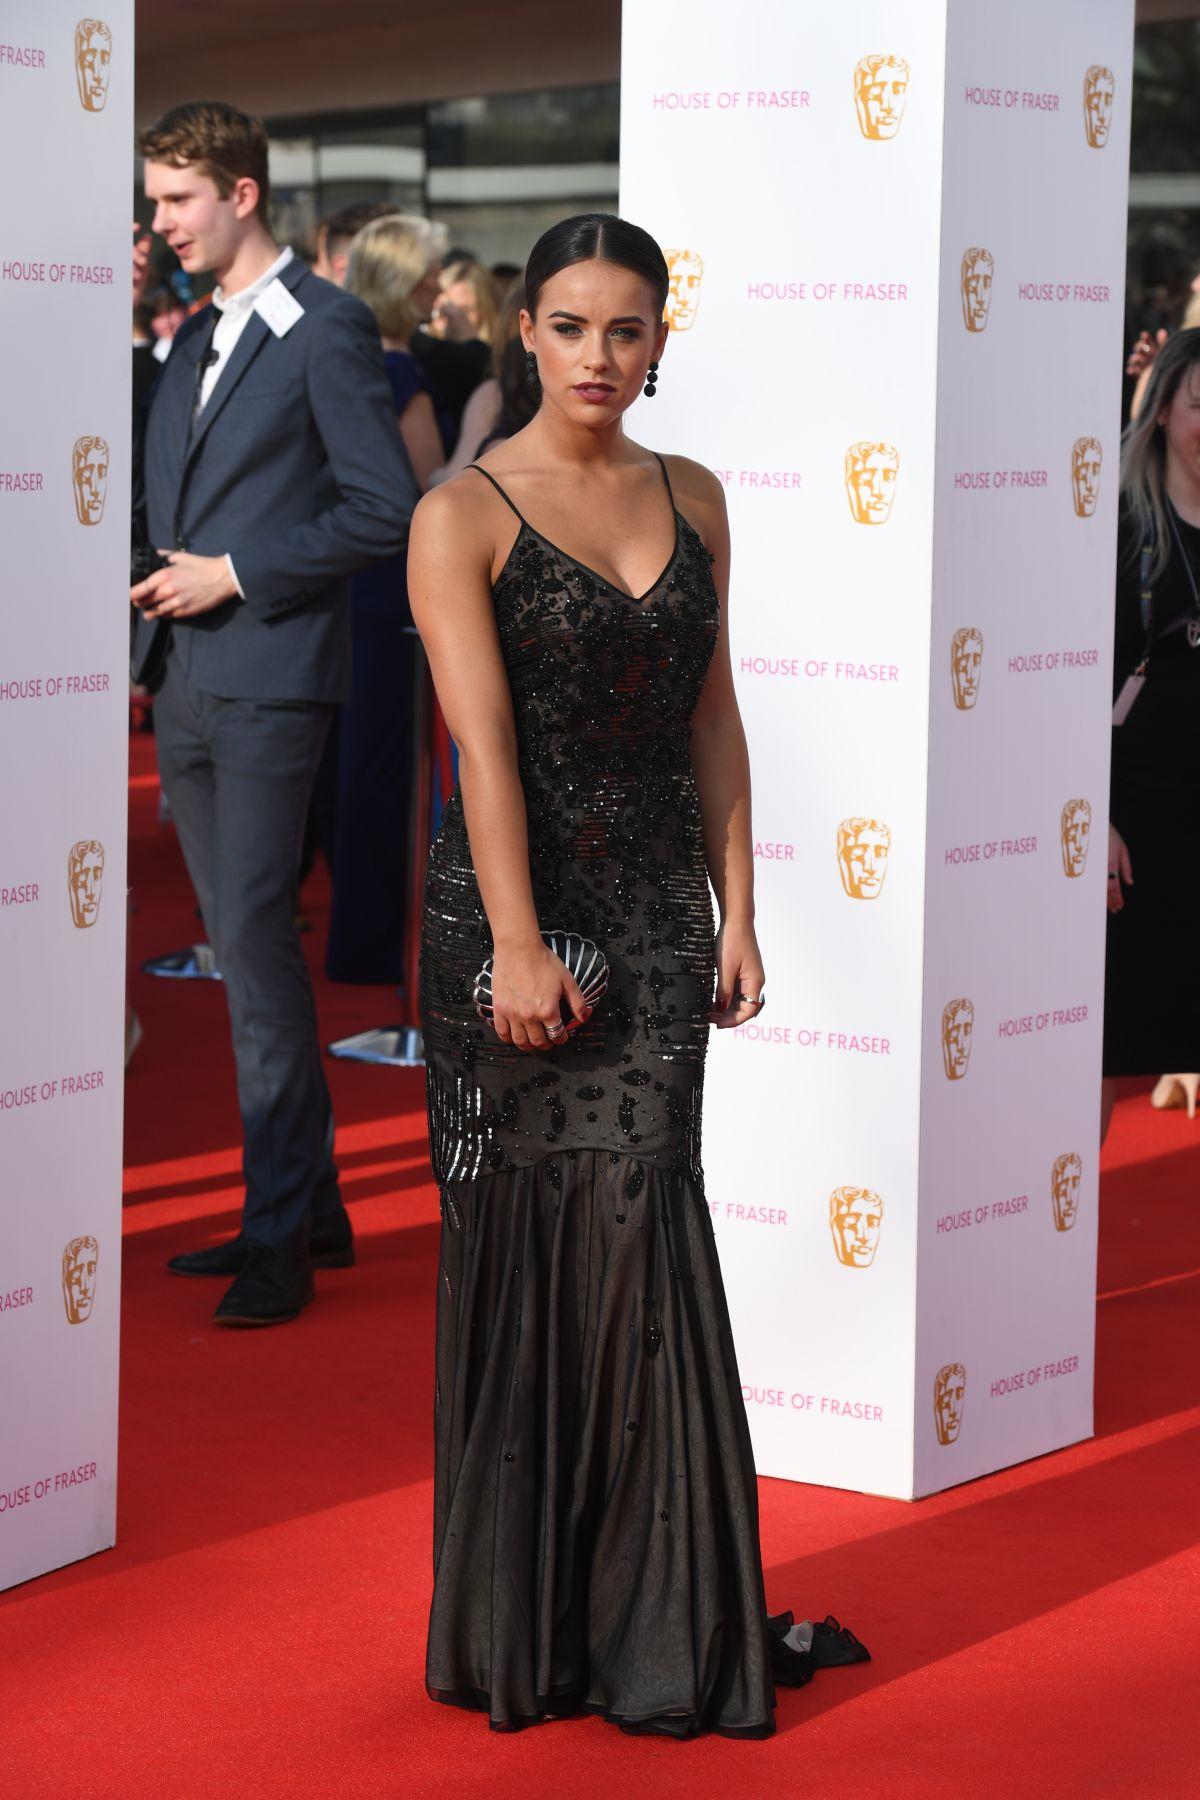 GEORGIA MAY FOOTE at House of Fraser British Academy Television Awards 05/08/2016